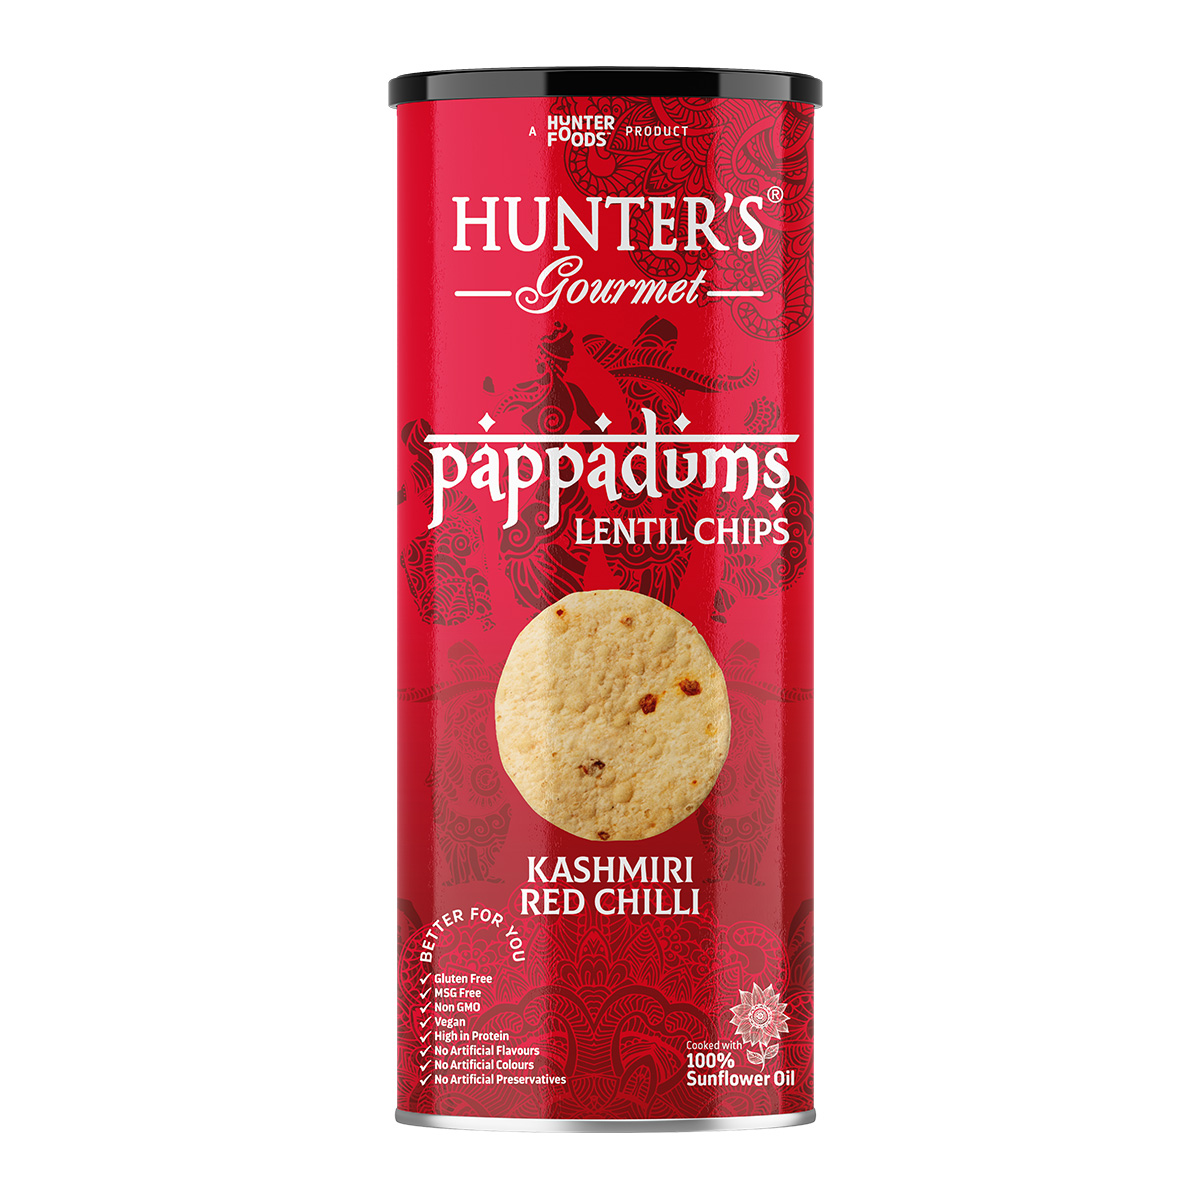 Hunter's Gourmet Baked PretzOs with Sea Salt (80gm)